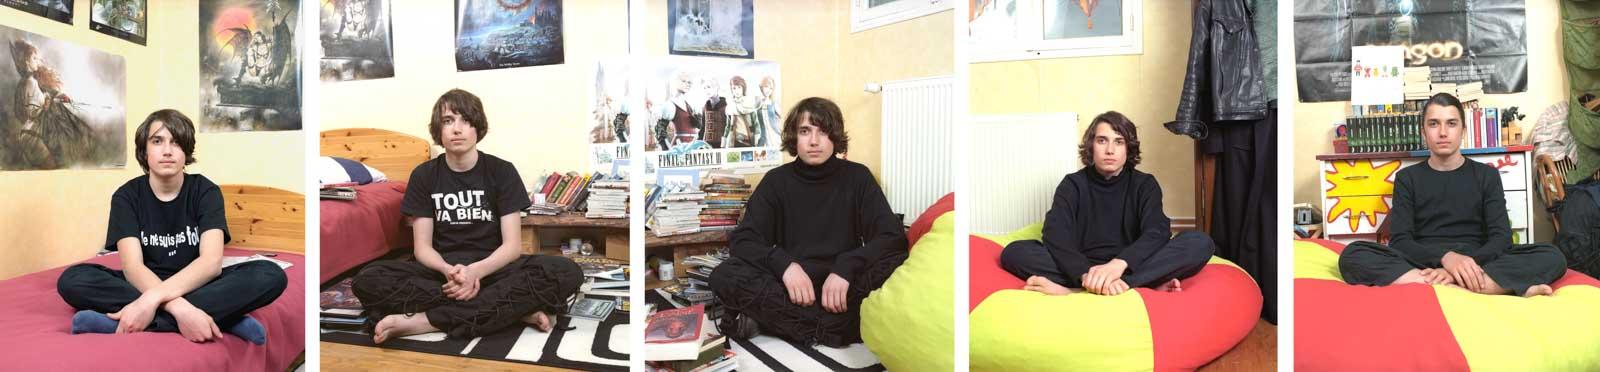 adolescents-5